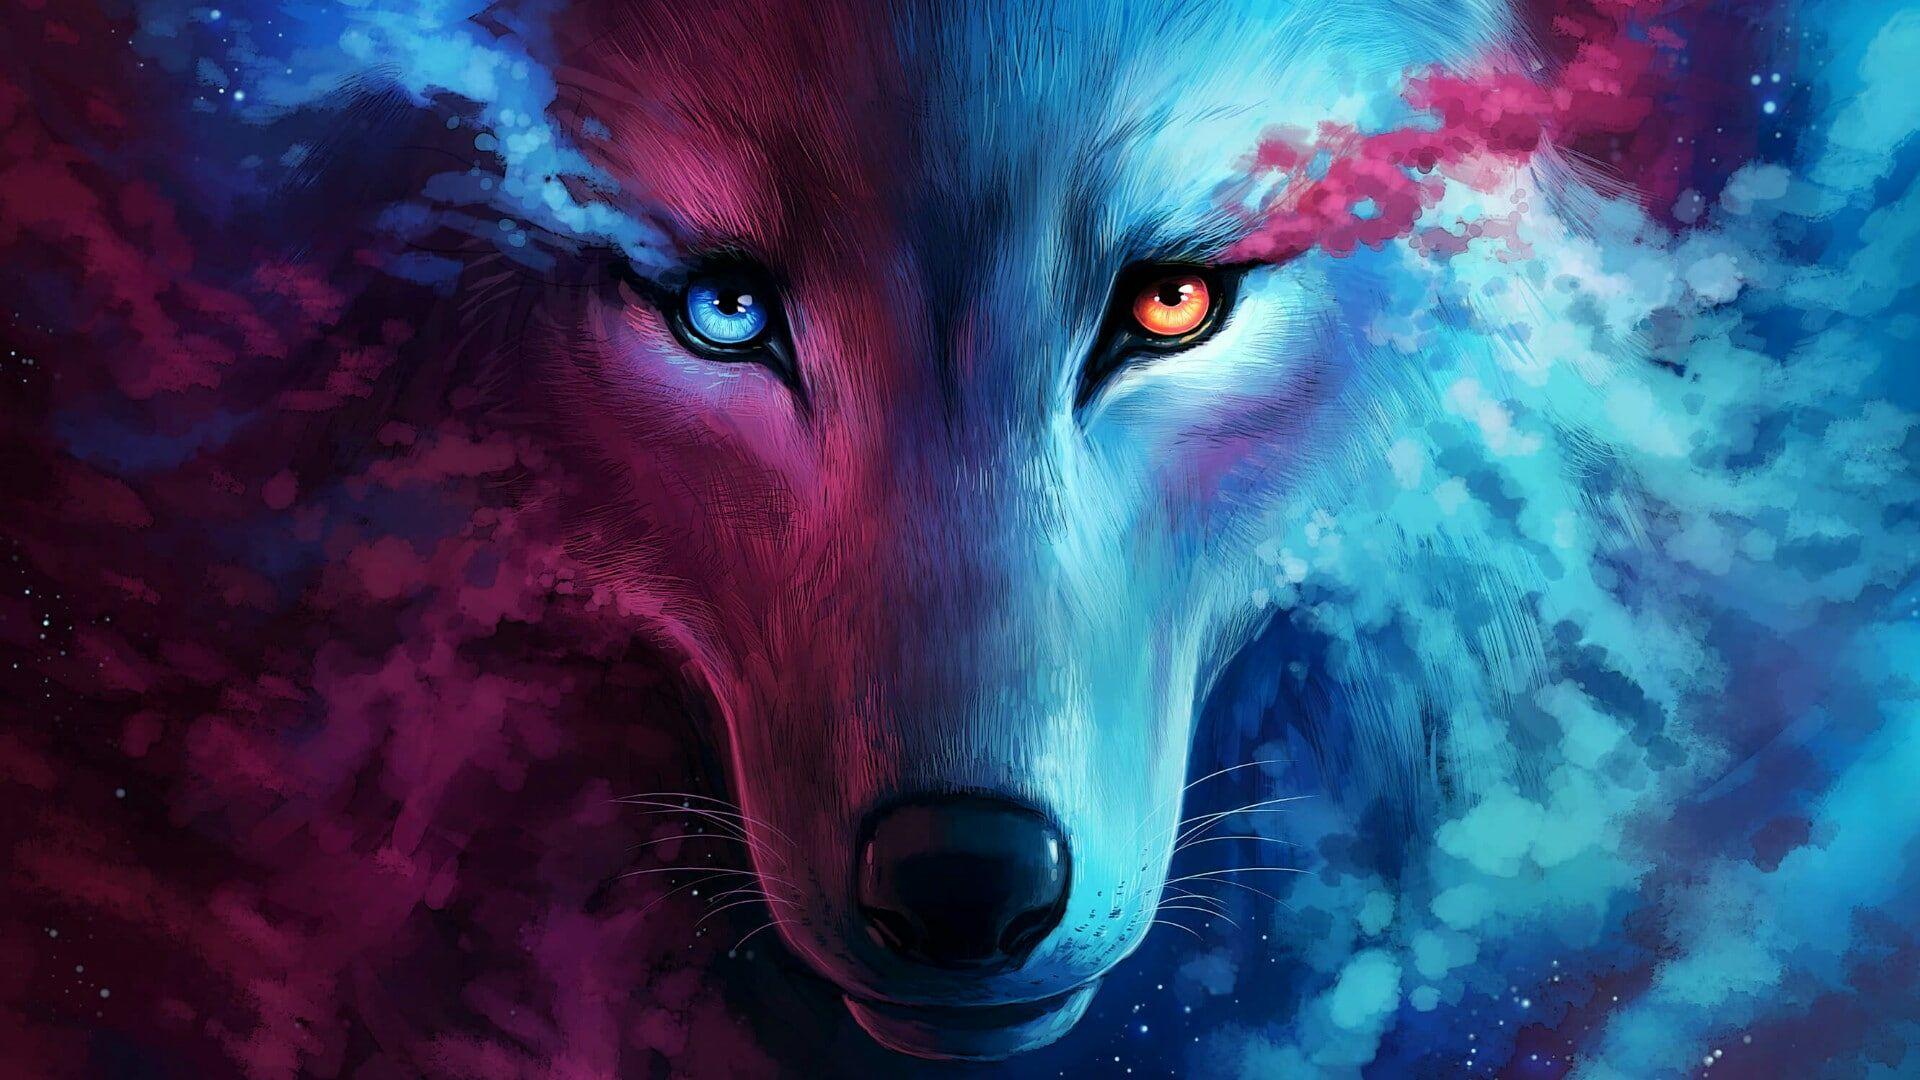 Wolf Art Fantasy Art Eyes Wild Animal 1080p Wallpaper